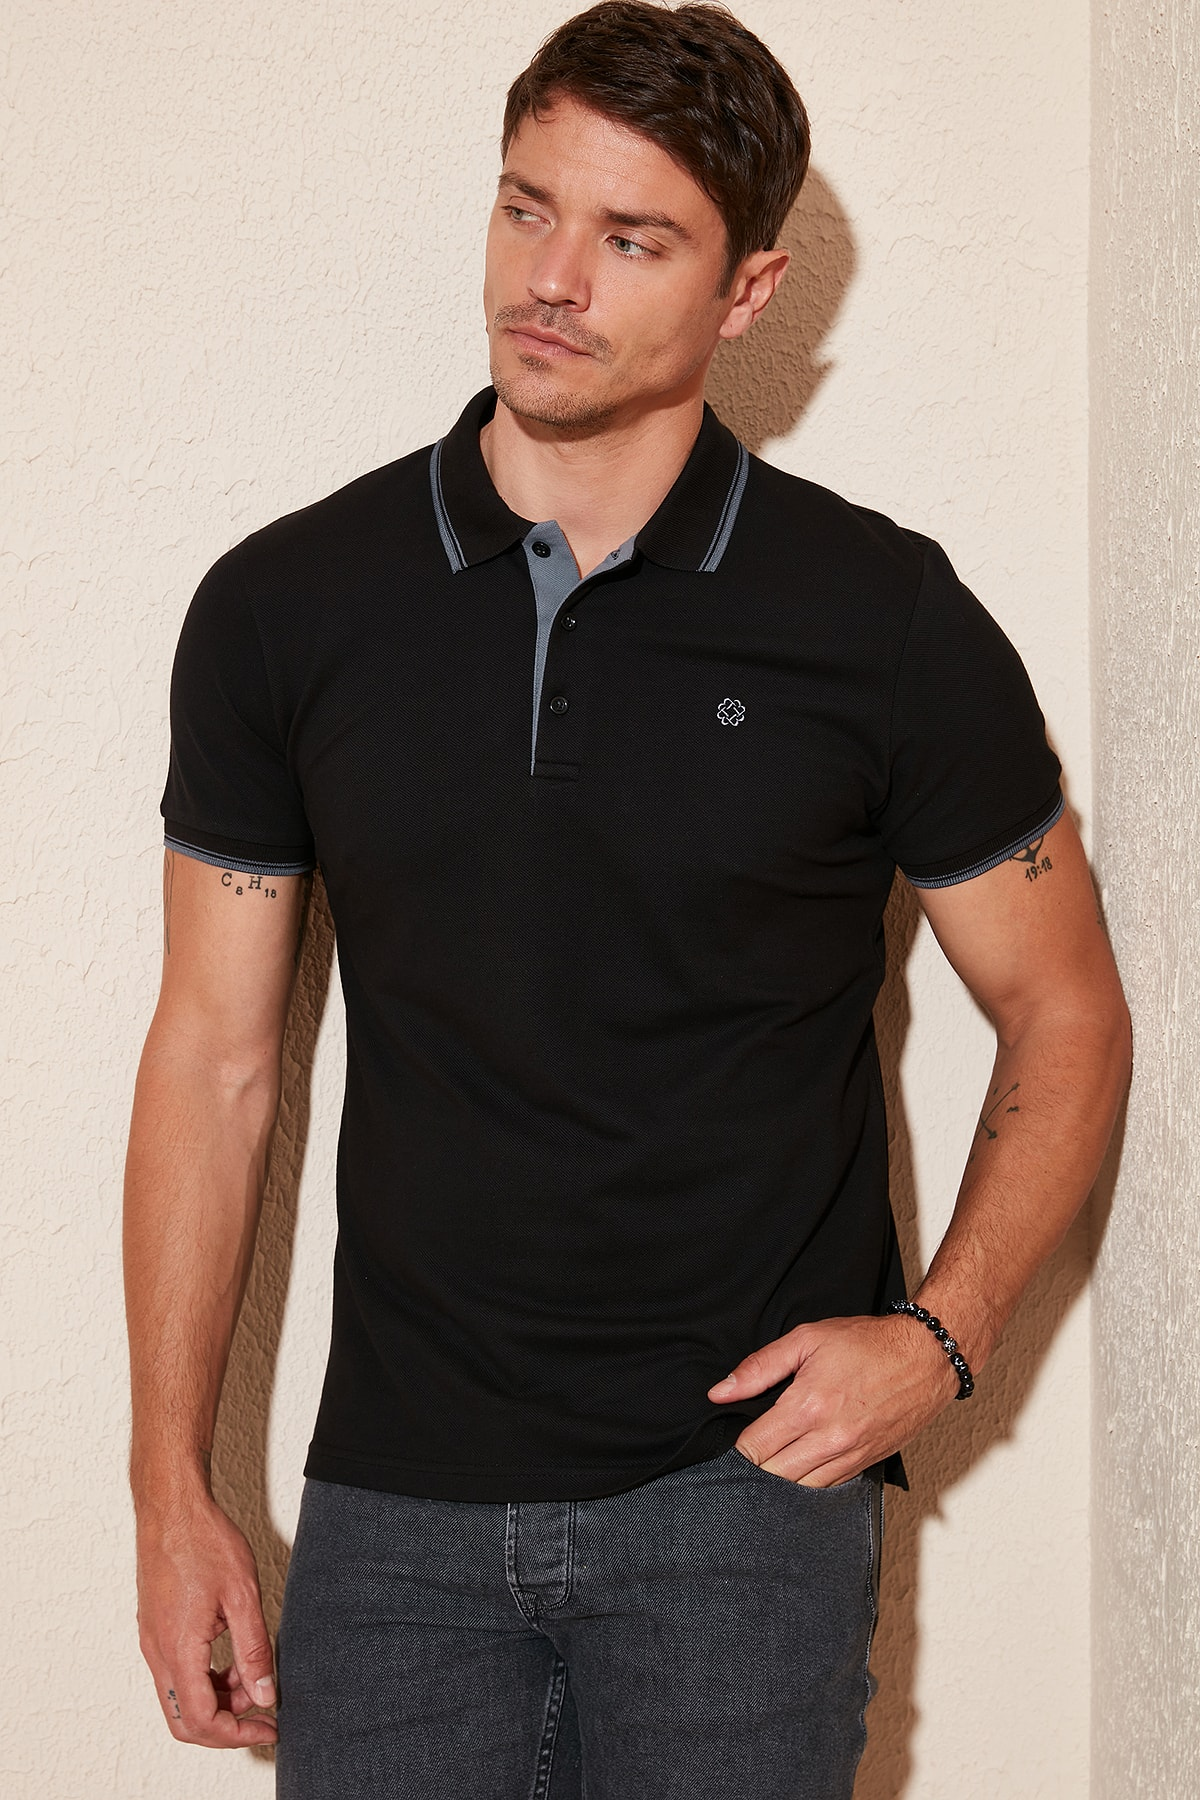 % 100 Pamuk Düğmeli Polo T Shirt Erkek Polo 5902118